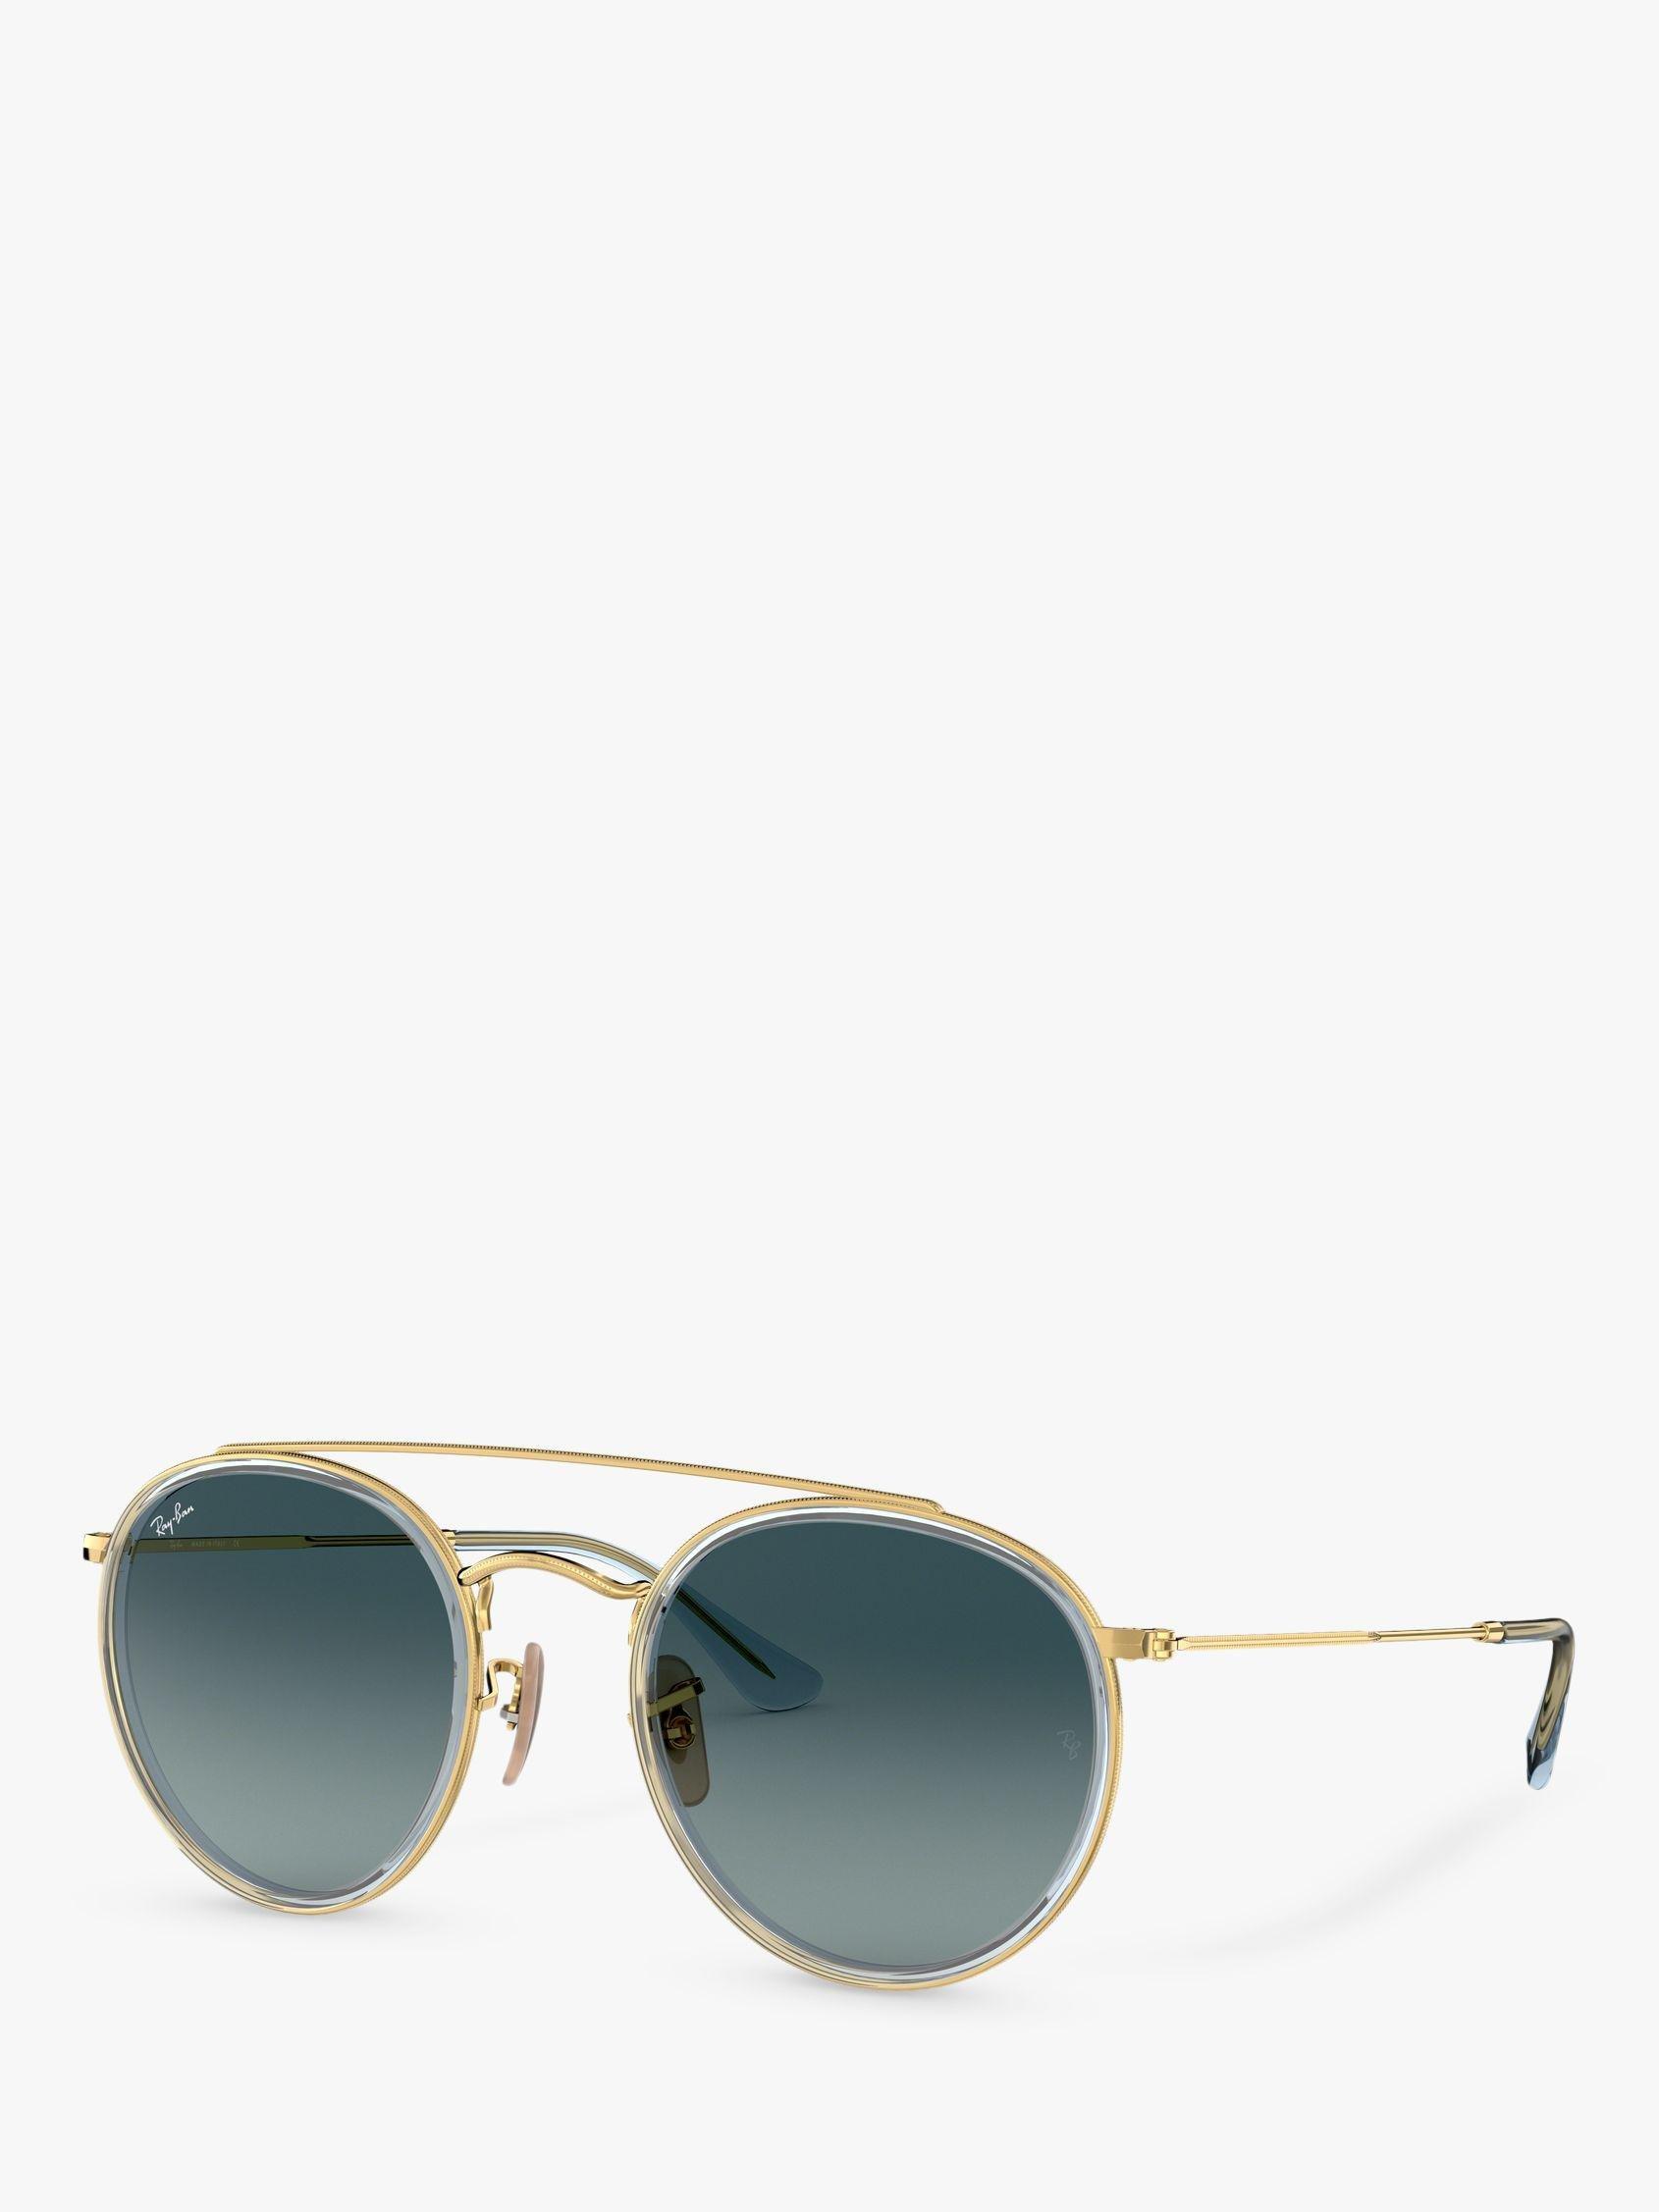 167dd94e4a3 Ray-Ban Rb3647n Unisex Double Bridge Oval Sunglasses for Men - Lyst